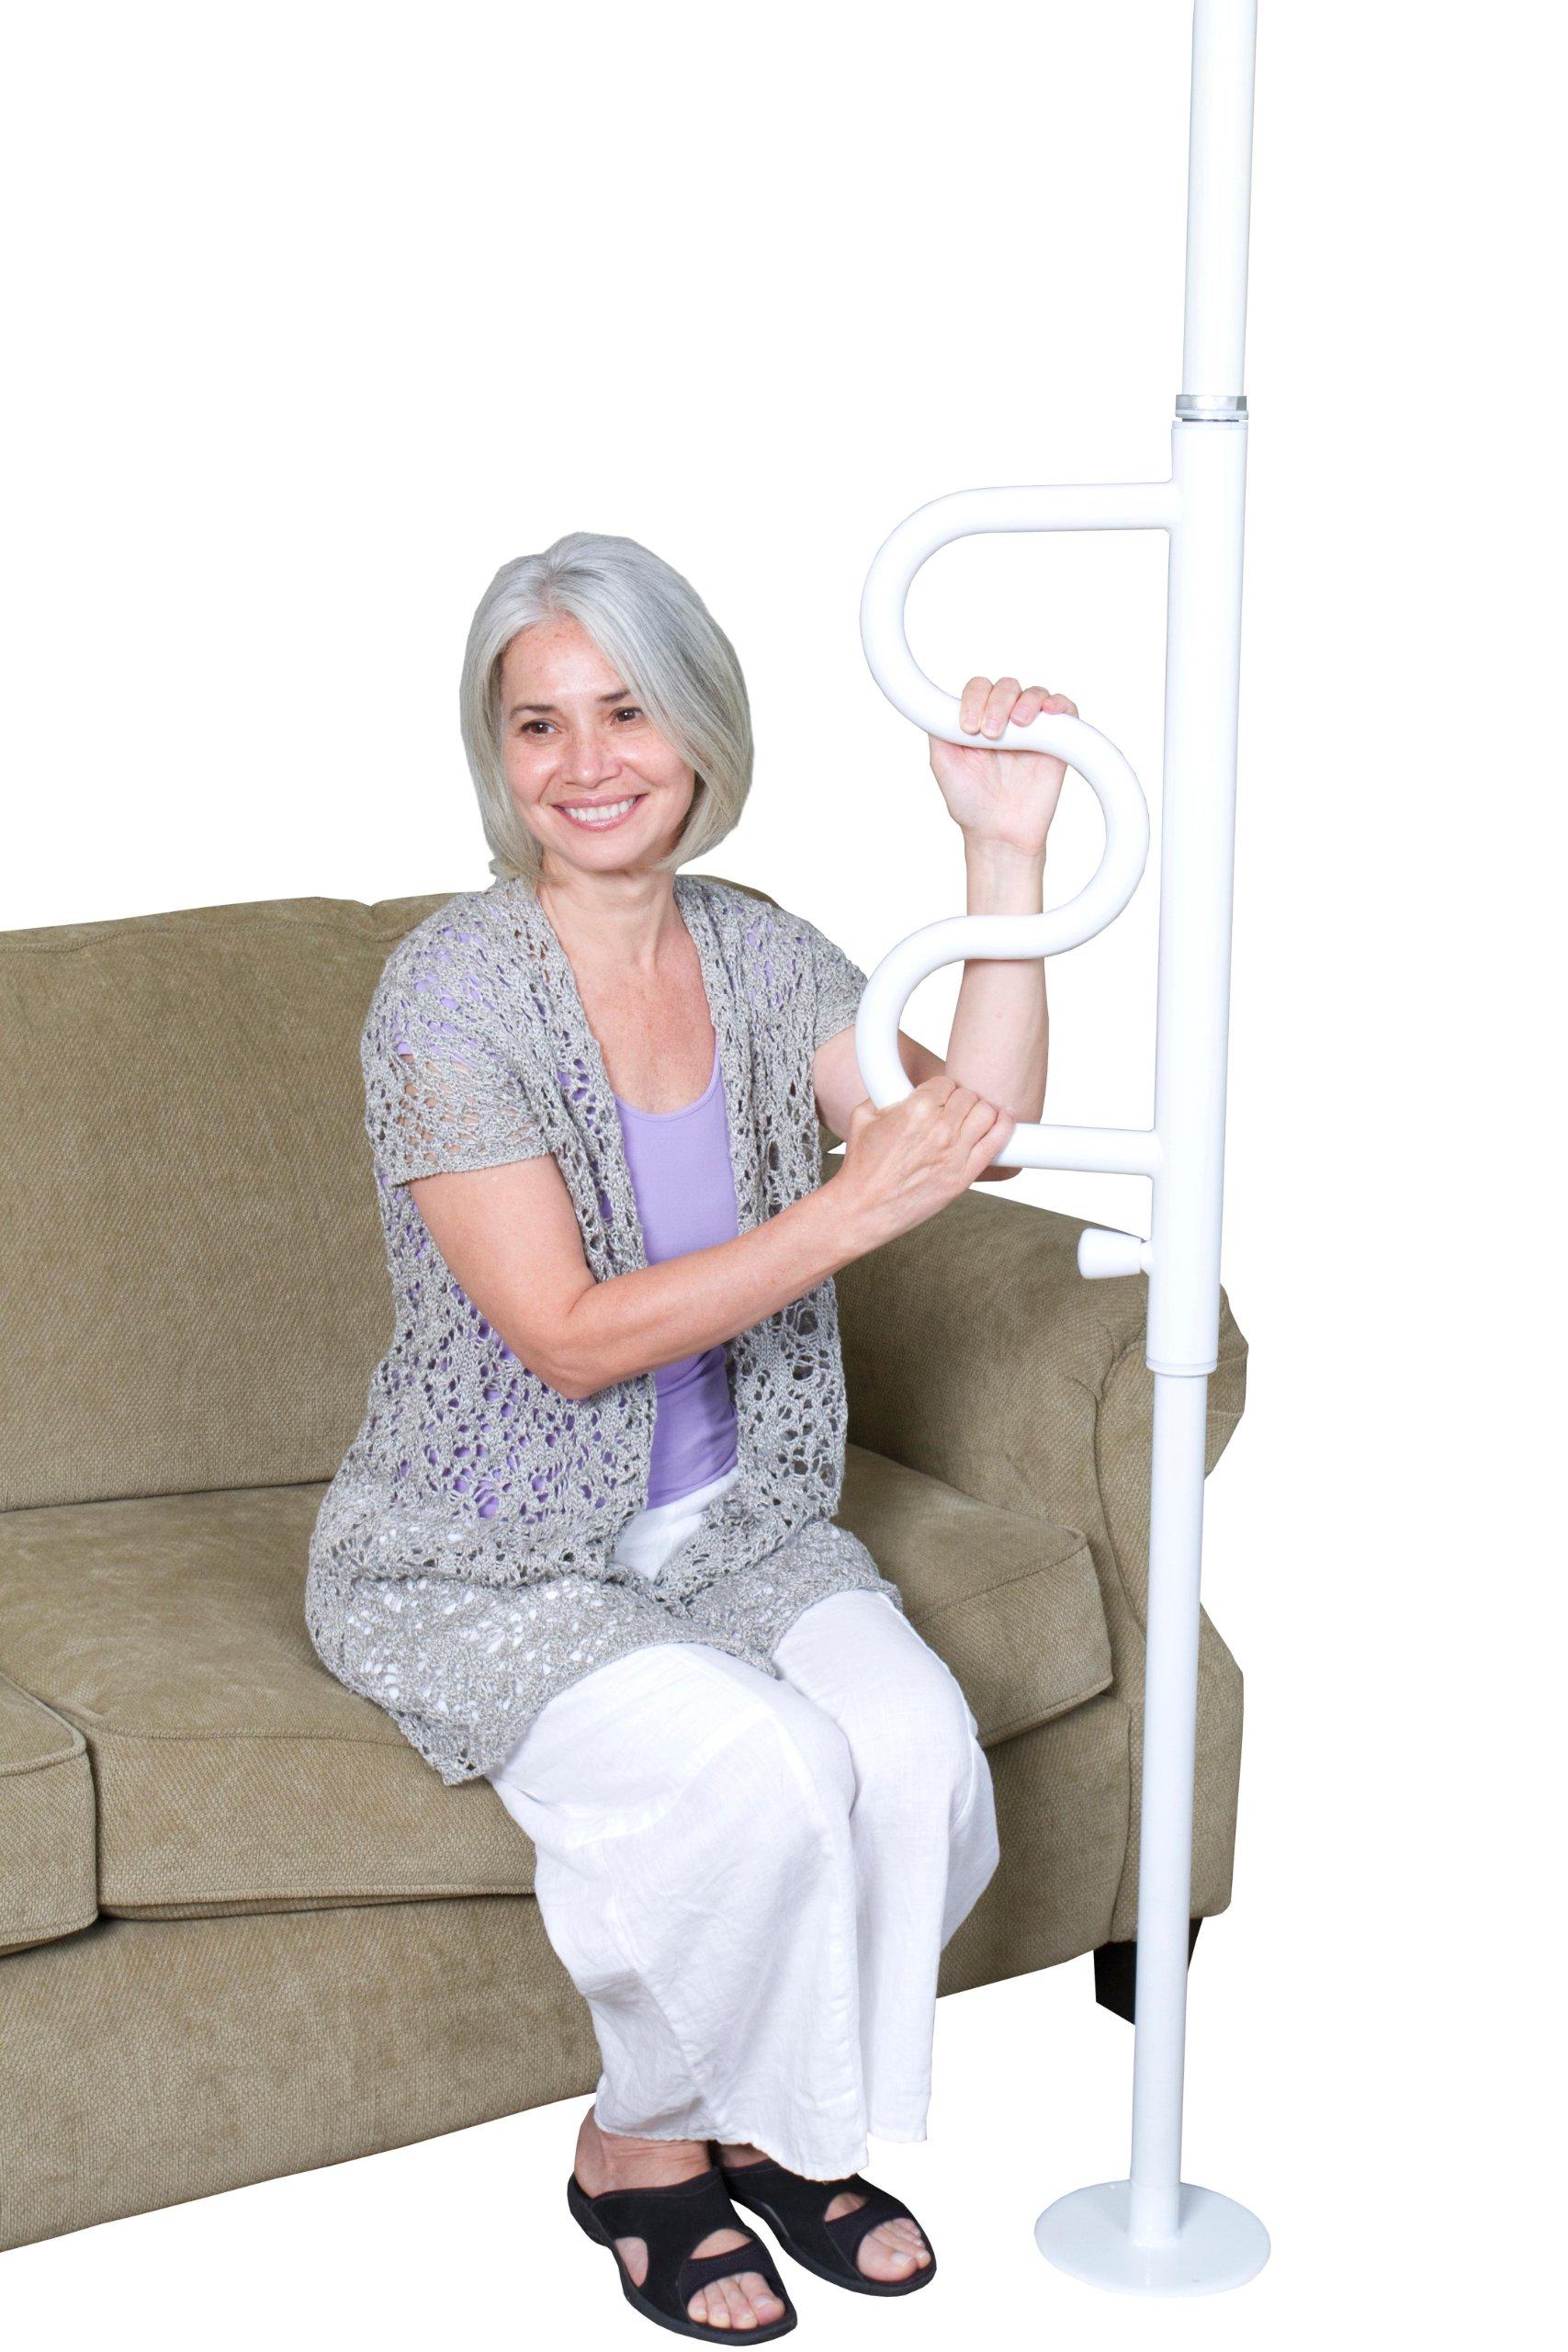 Stander Security Pole & Curve Grab Bar - Elderly Tension Mounted Transfer Pole + Bathroom Assist Grab Bar - Iceberg White by Stander (Image #7)